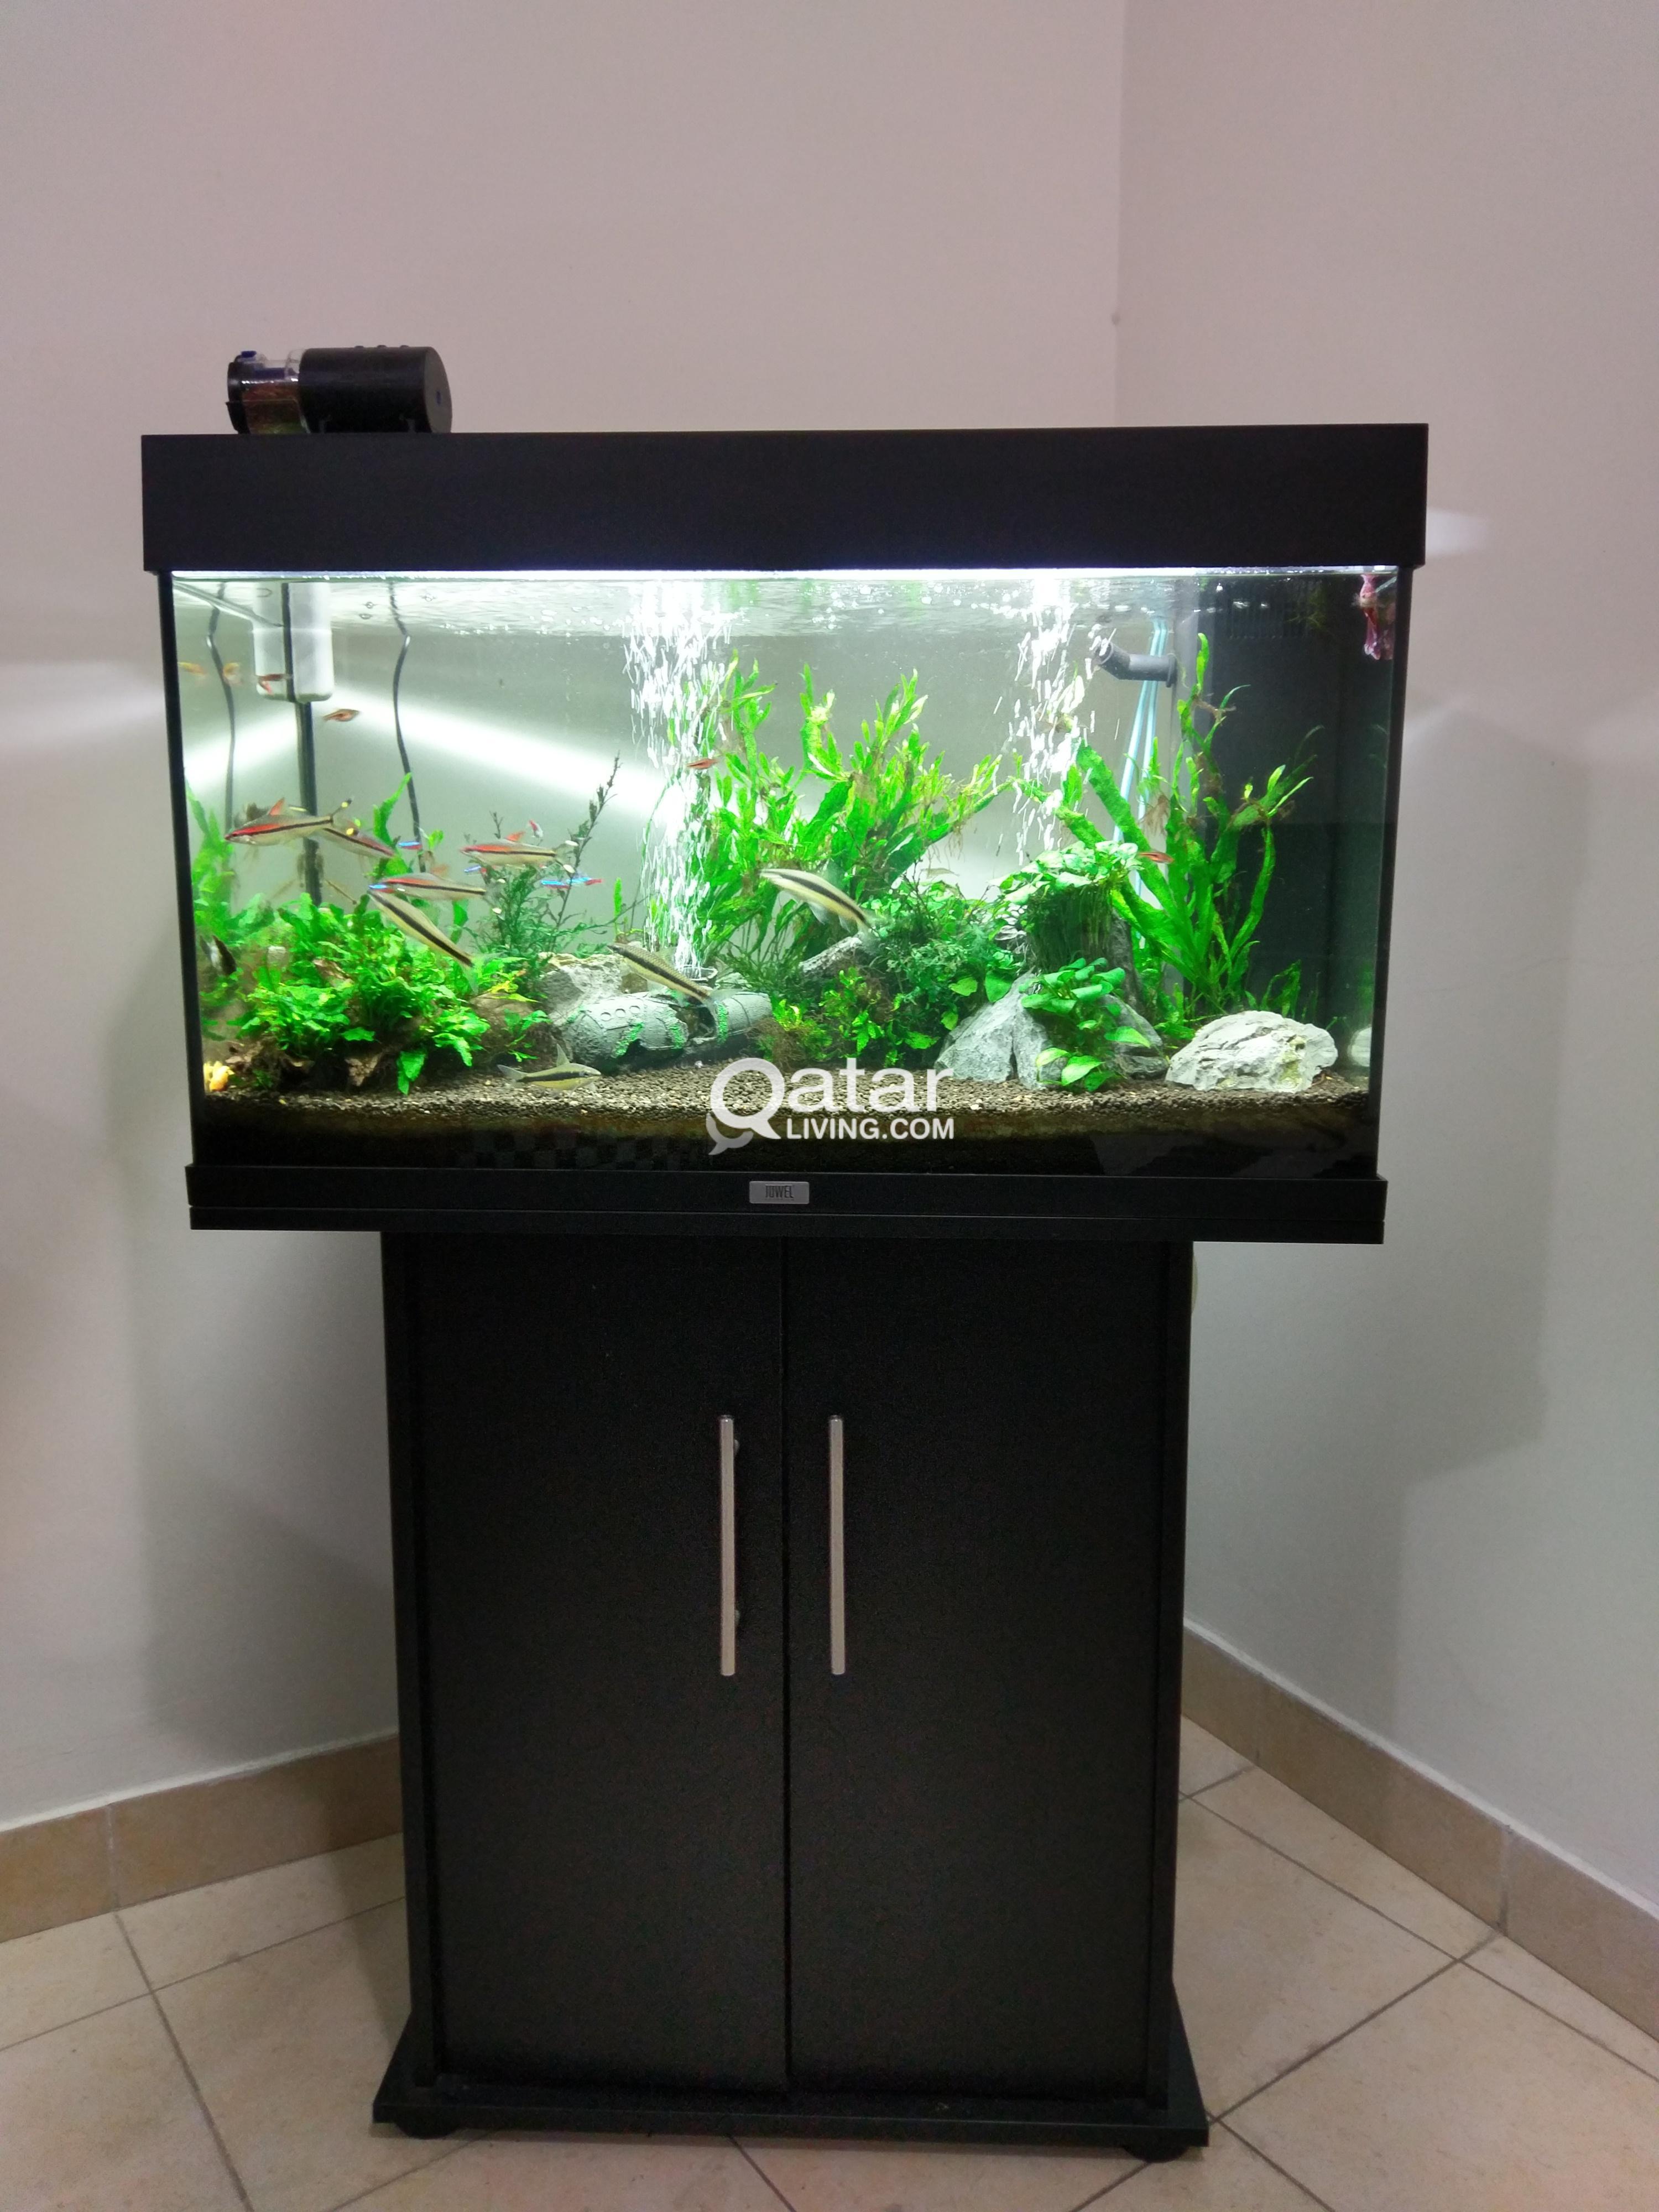 Branded aquarium fish tank for sale qatar living for Fish aquarium for sale